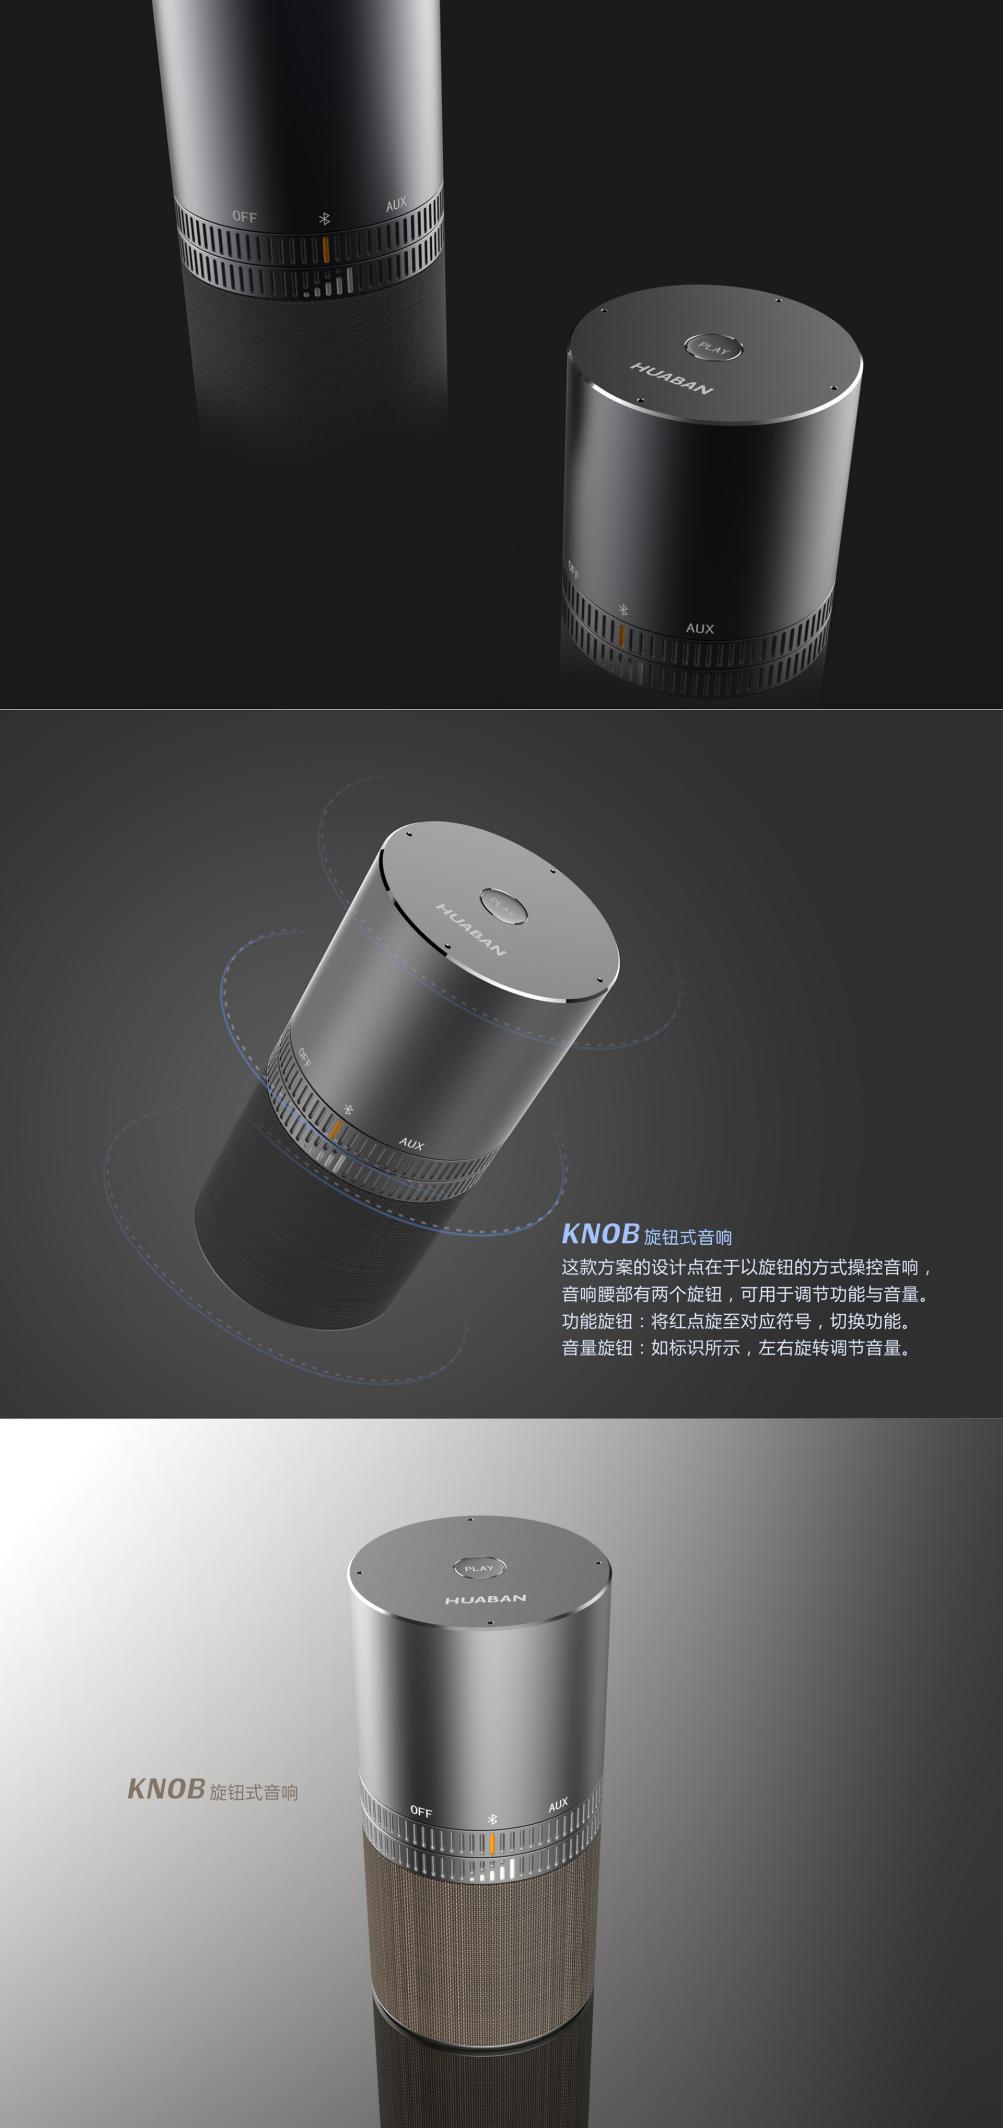 KNOB旋钮式智能音箱